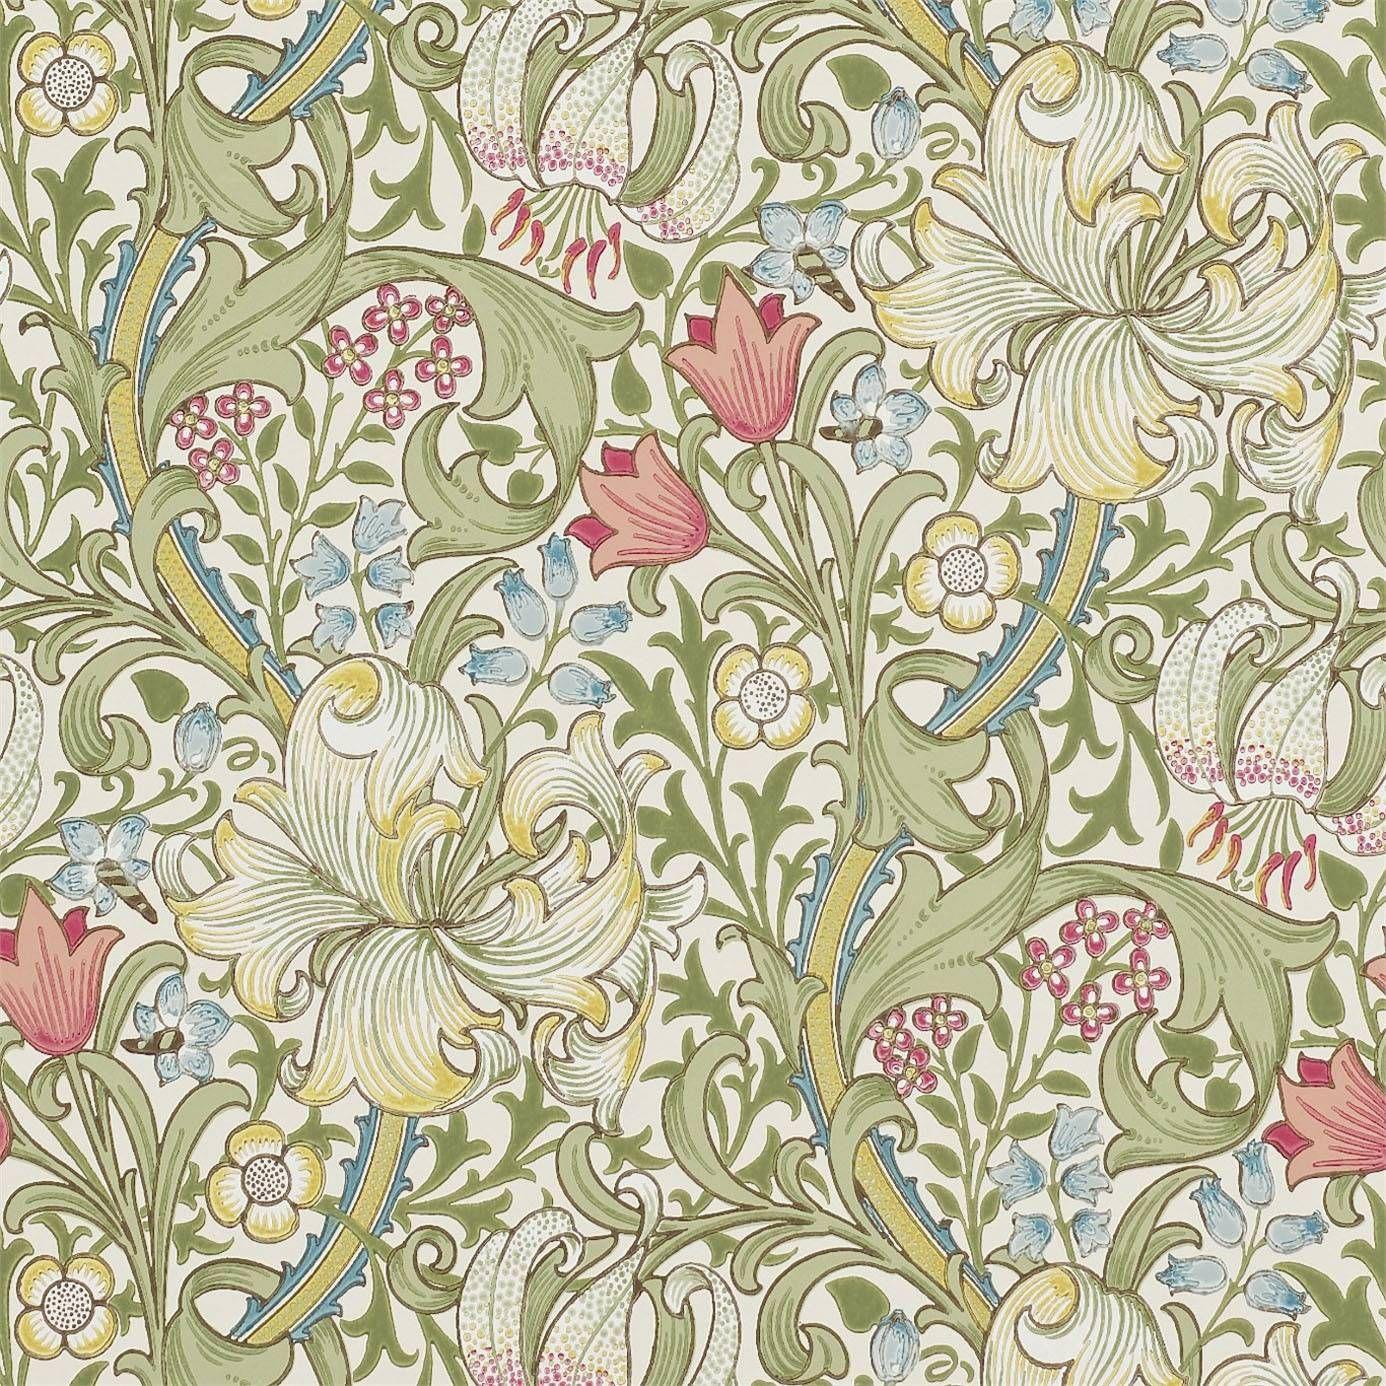 william morris wallpaper | William Morris & Co Archive Wallpapers ...